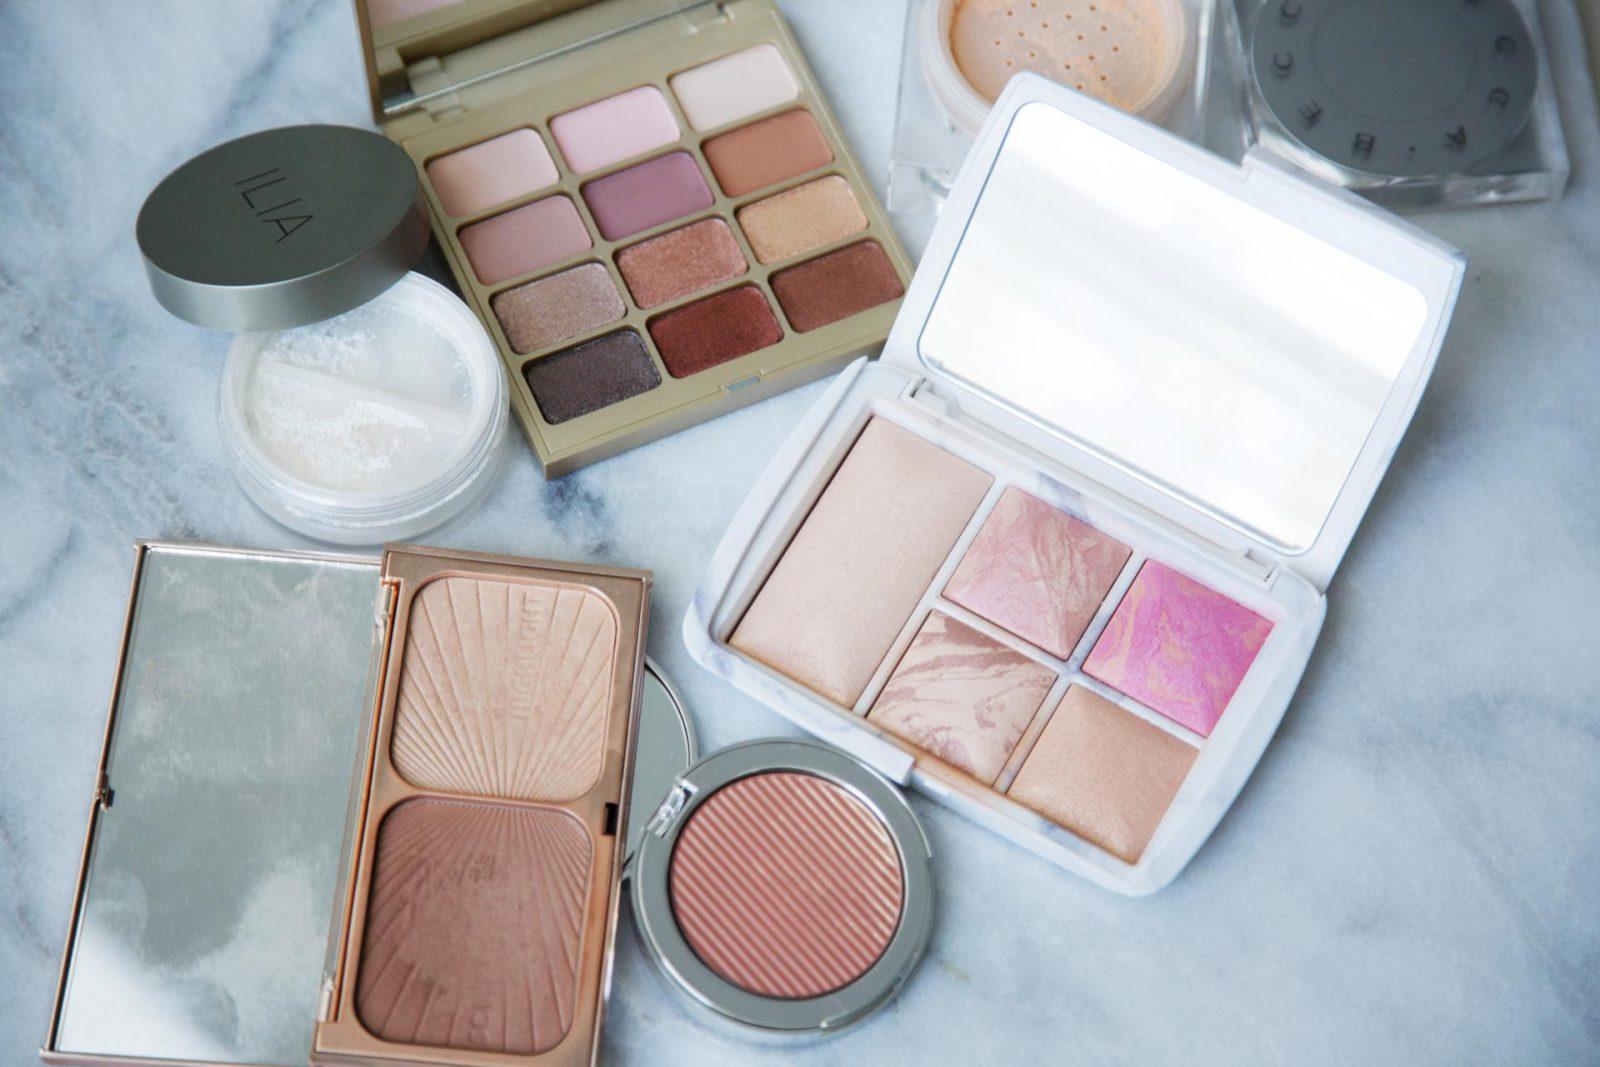 makeup shelf life powders